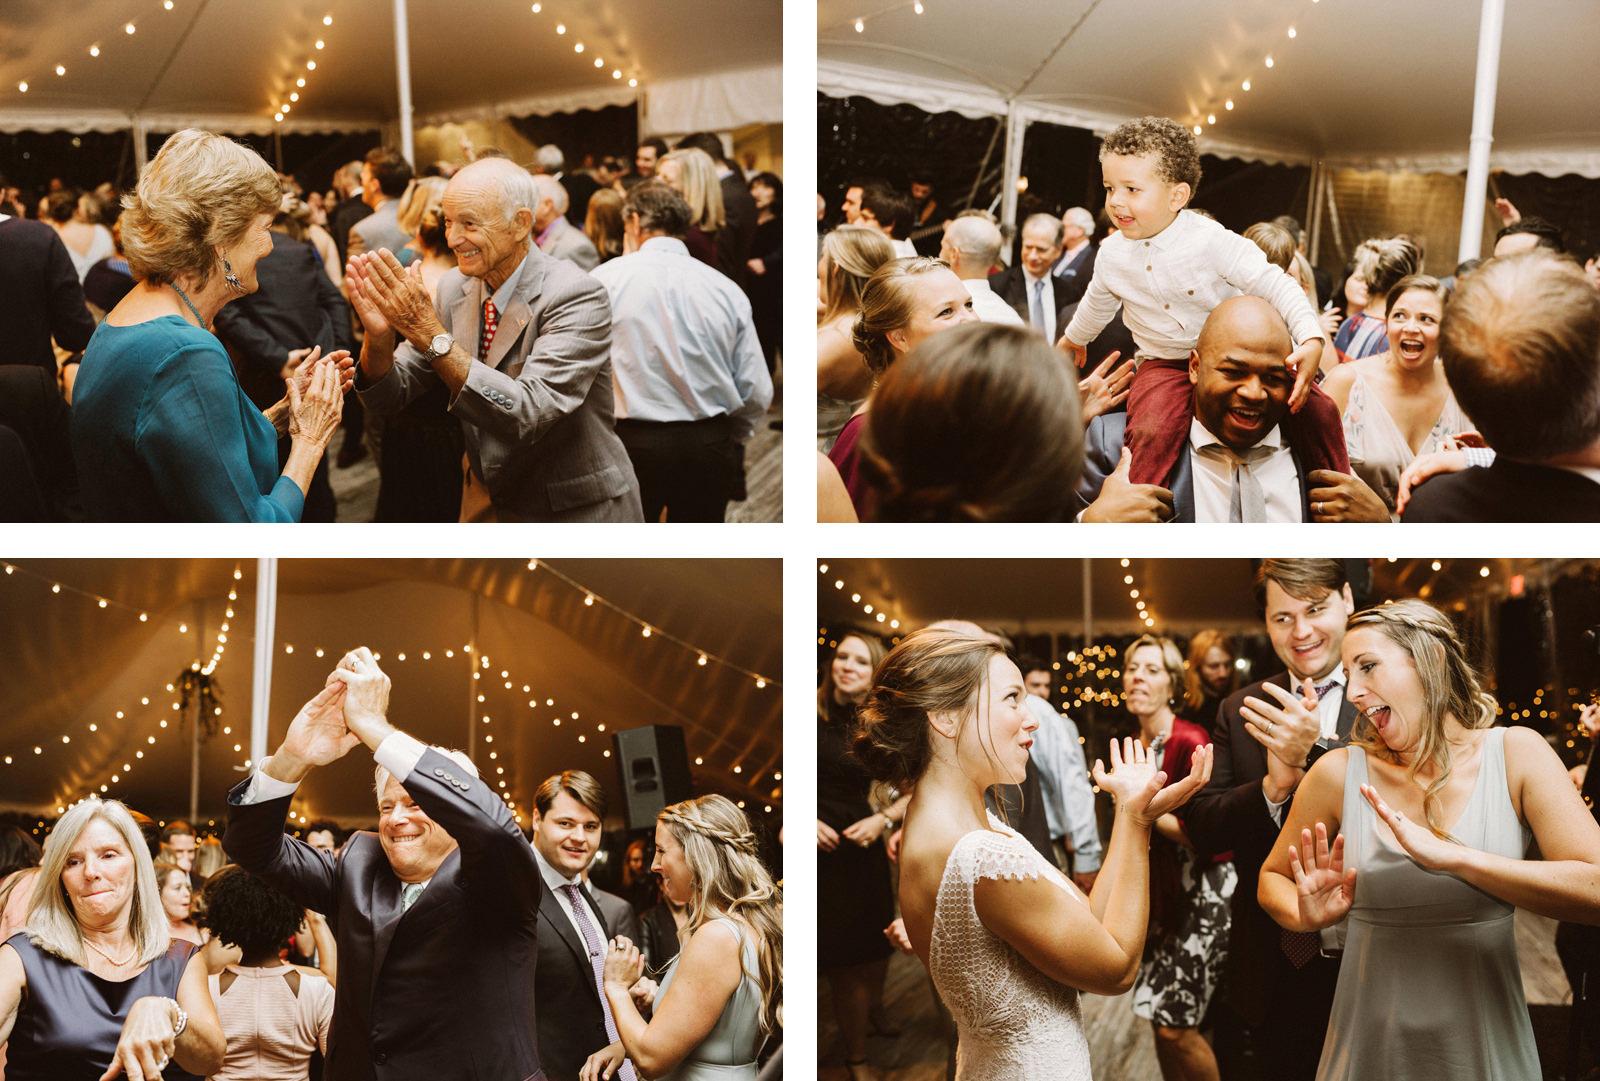 bridgeport-wedding-146 BRIDGEPORT, CONNECTICUT BACKYARD WEDDING